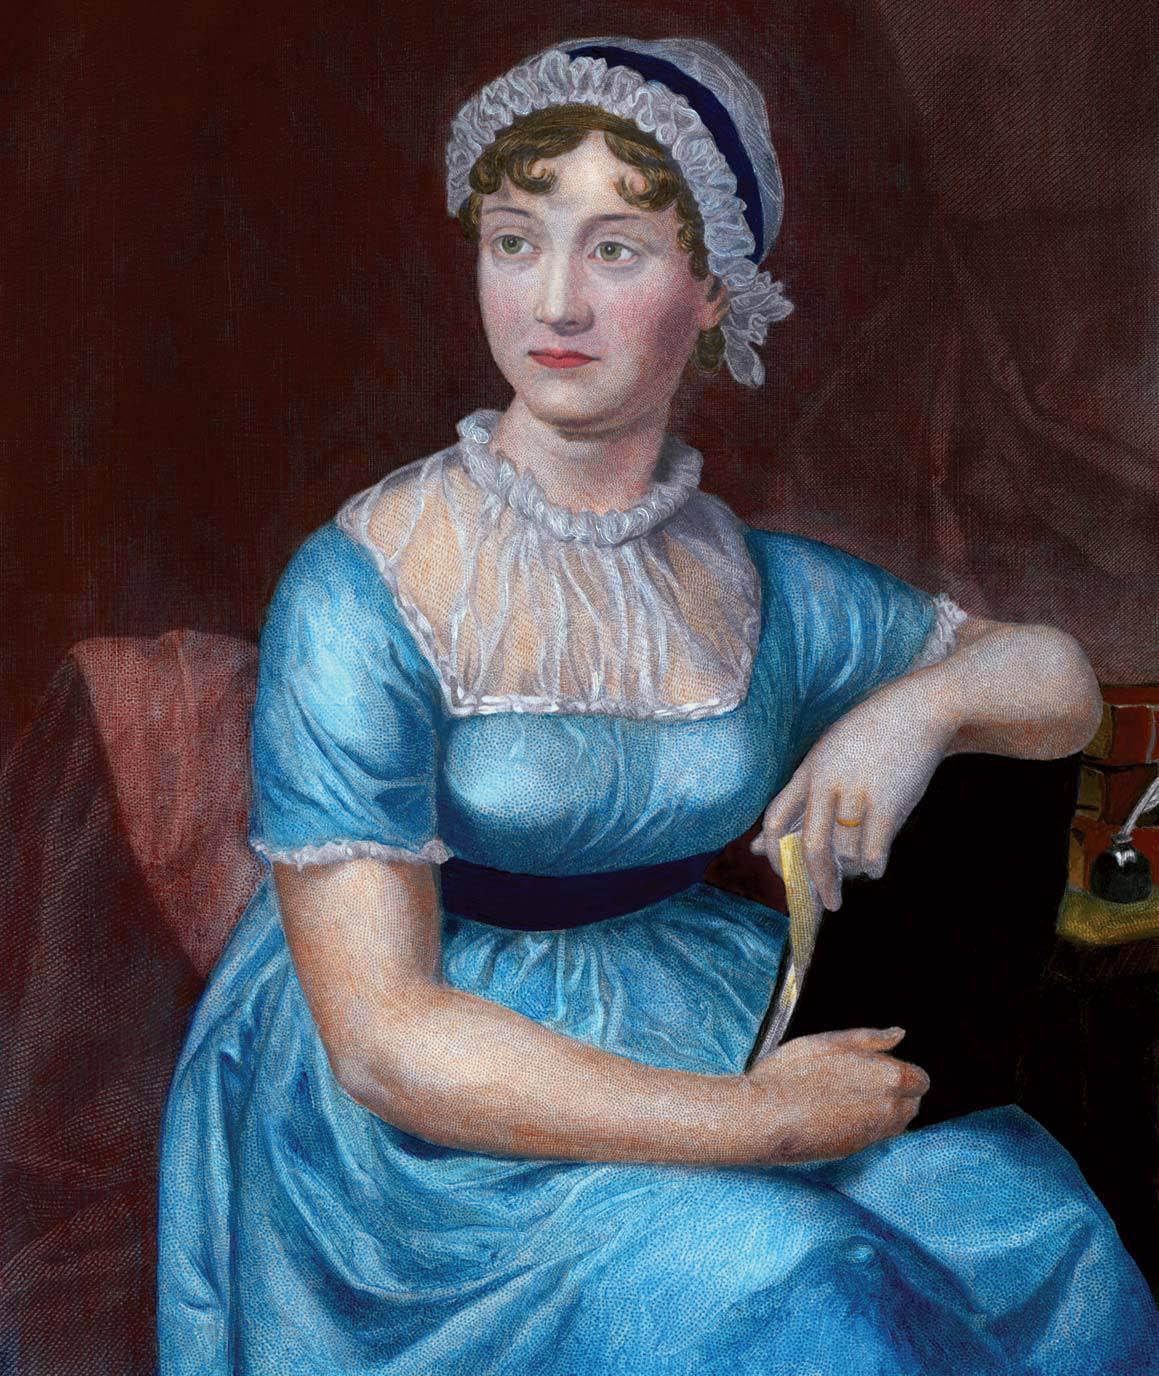 jane-austen-cassandra-engraving-portrait-1810_1.jpg